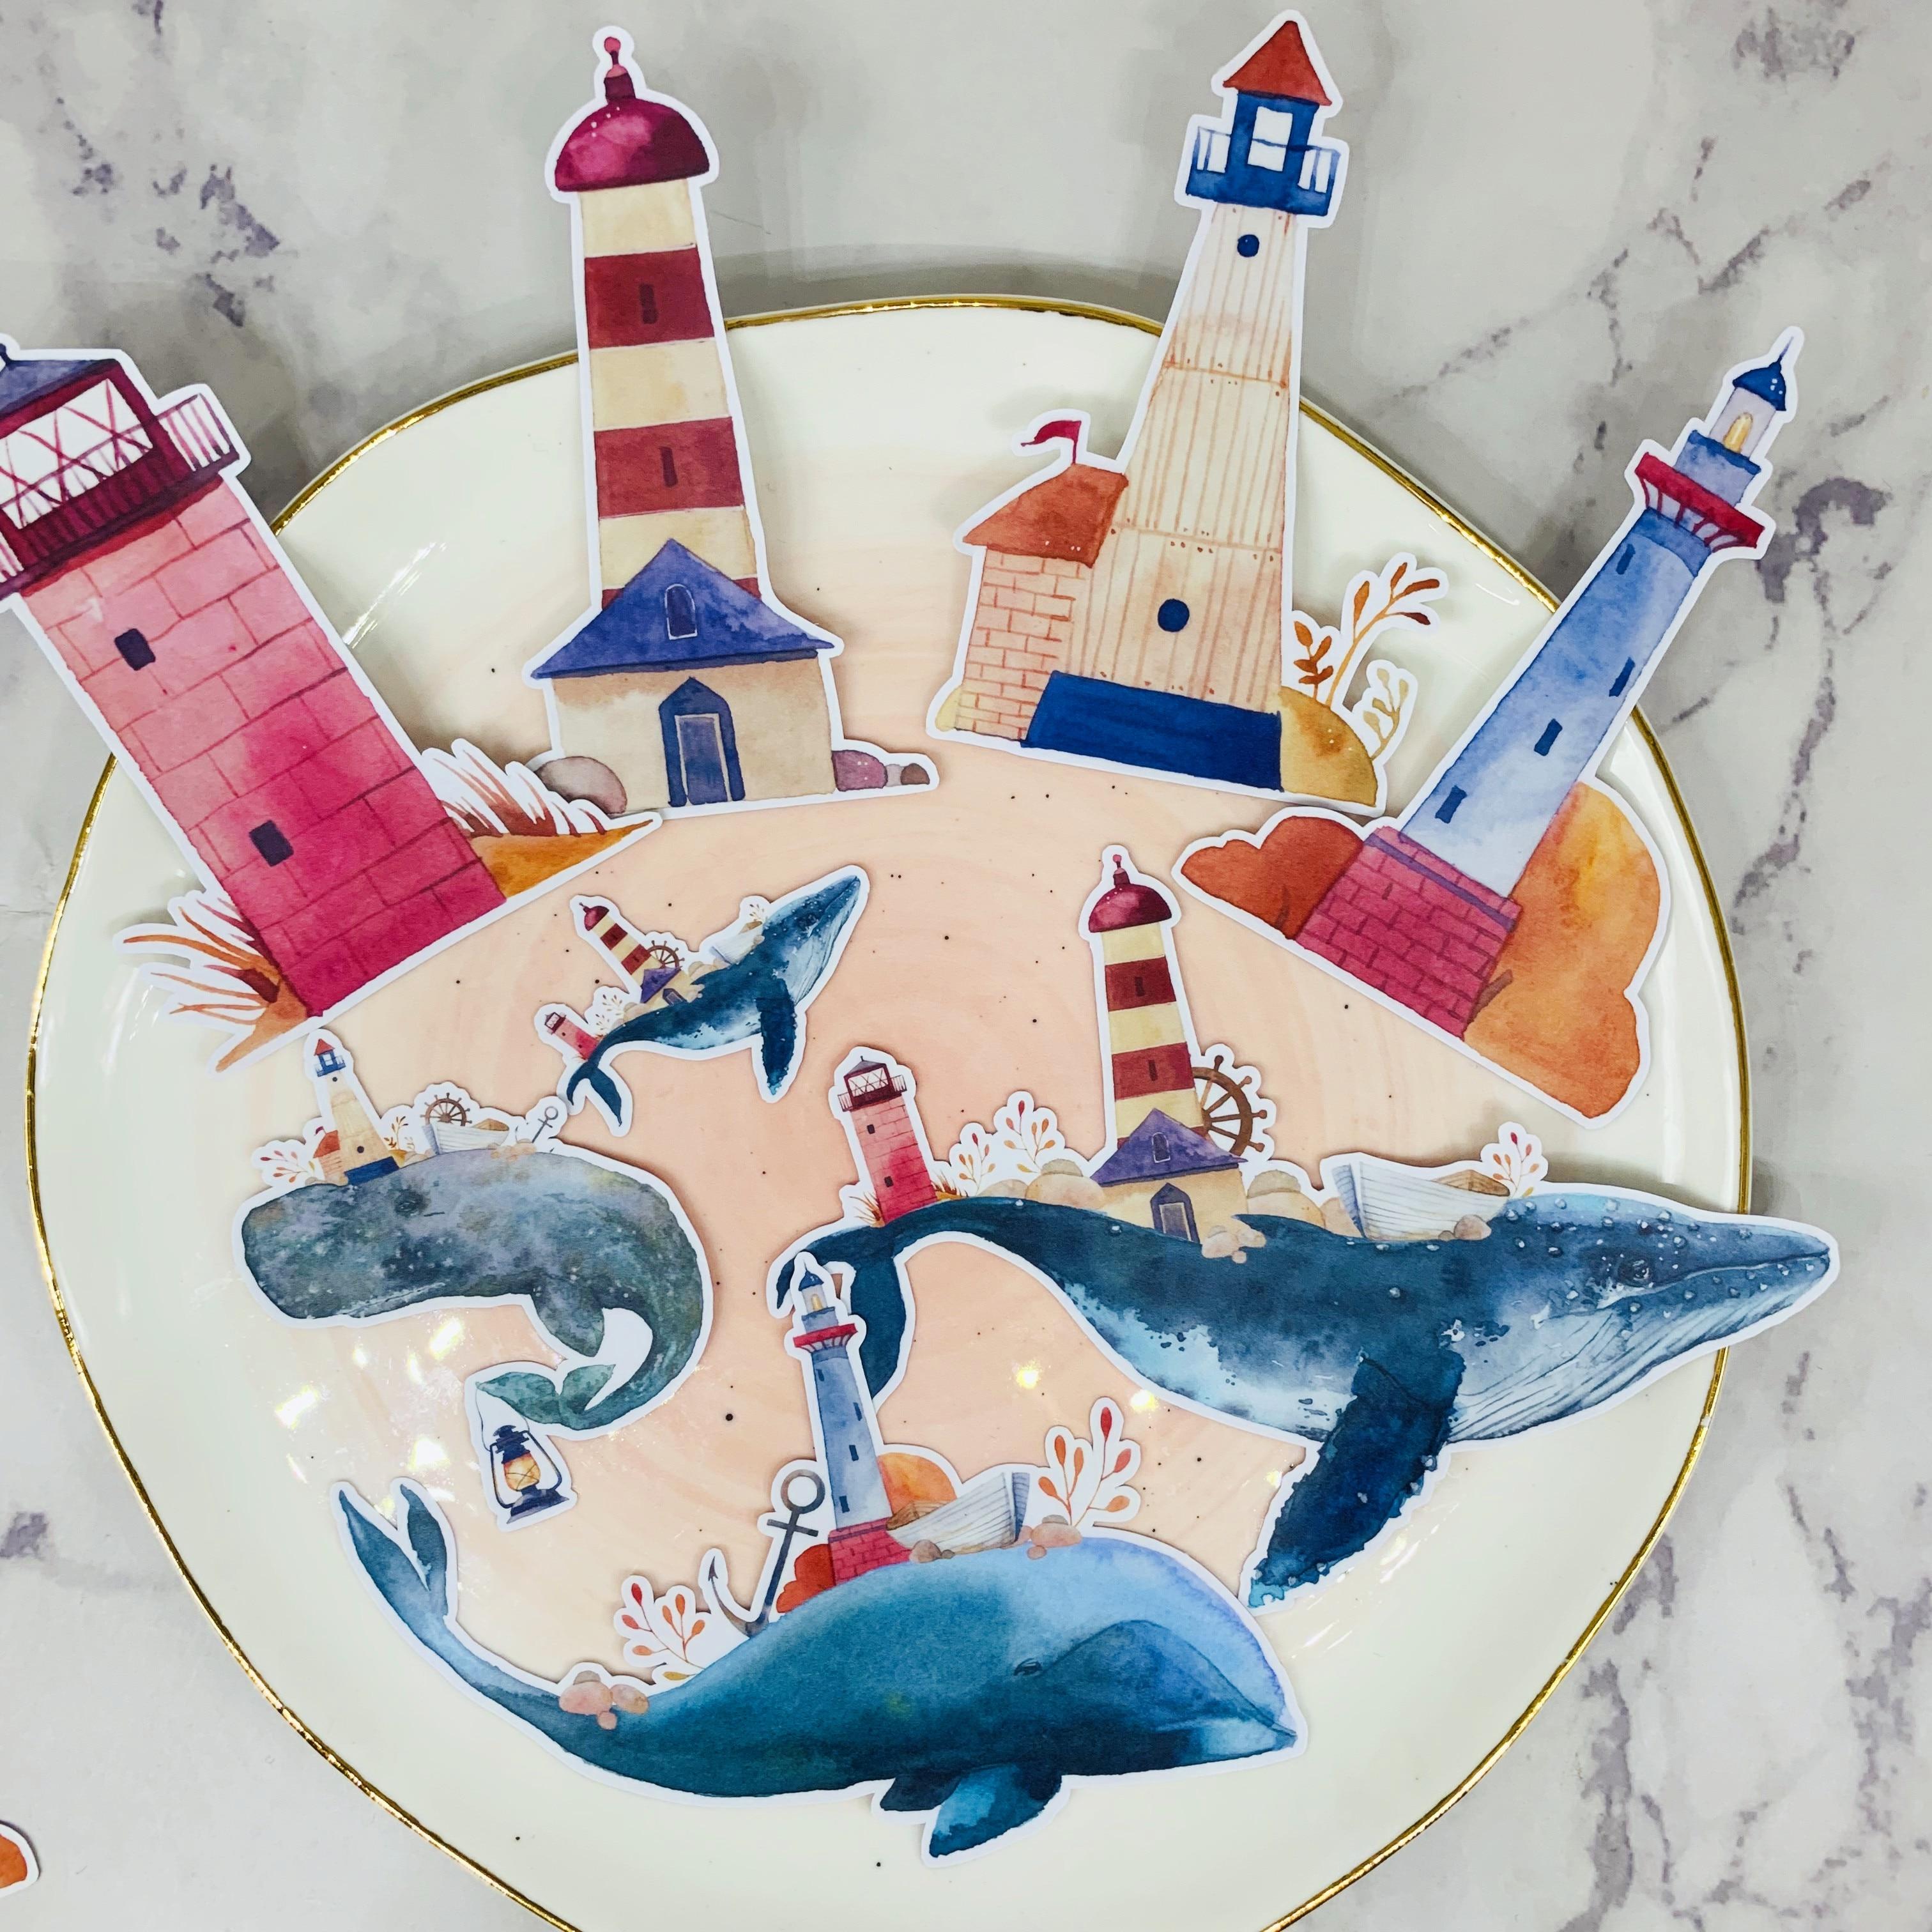 12Pcs/Bag Vintage Whale Lighthouse Sticker DIY Scrapbooking Album Junk Journal Planner Decorative Stickers